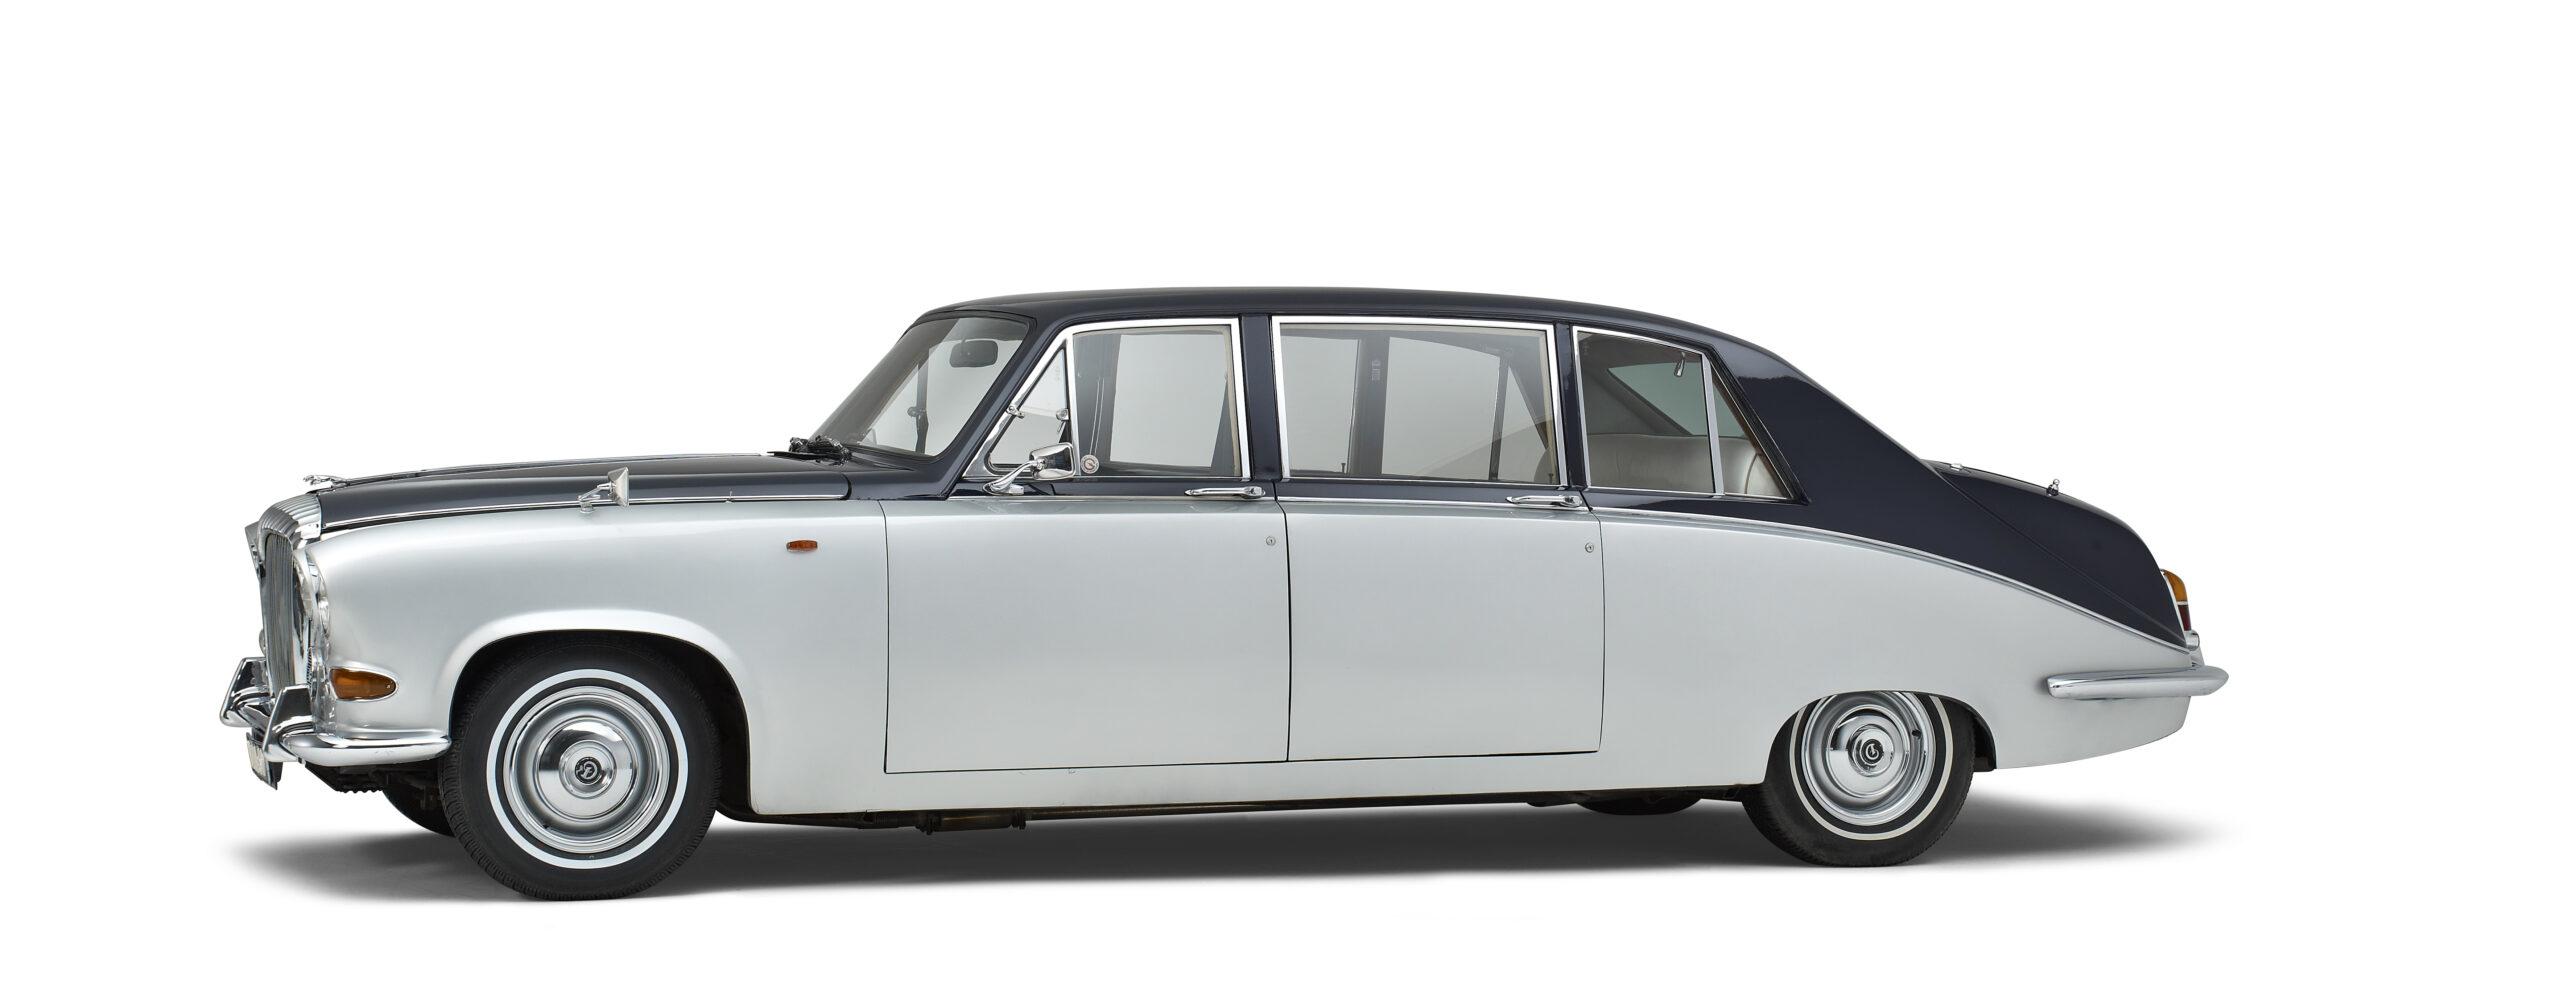 Daimler klassieke oldtimer volgauto